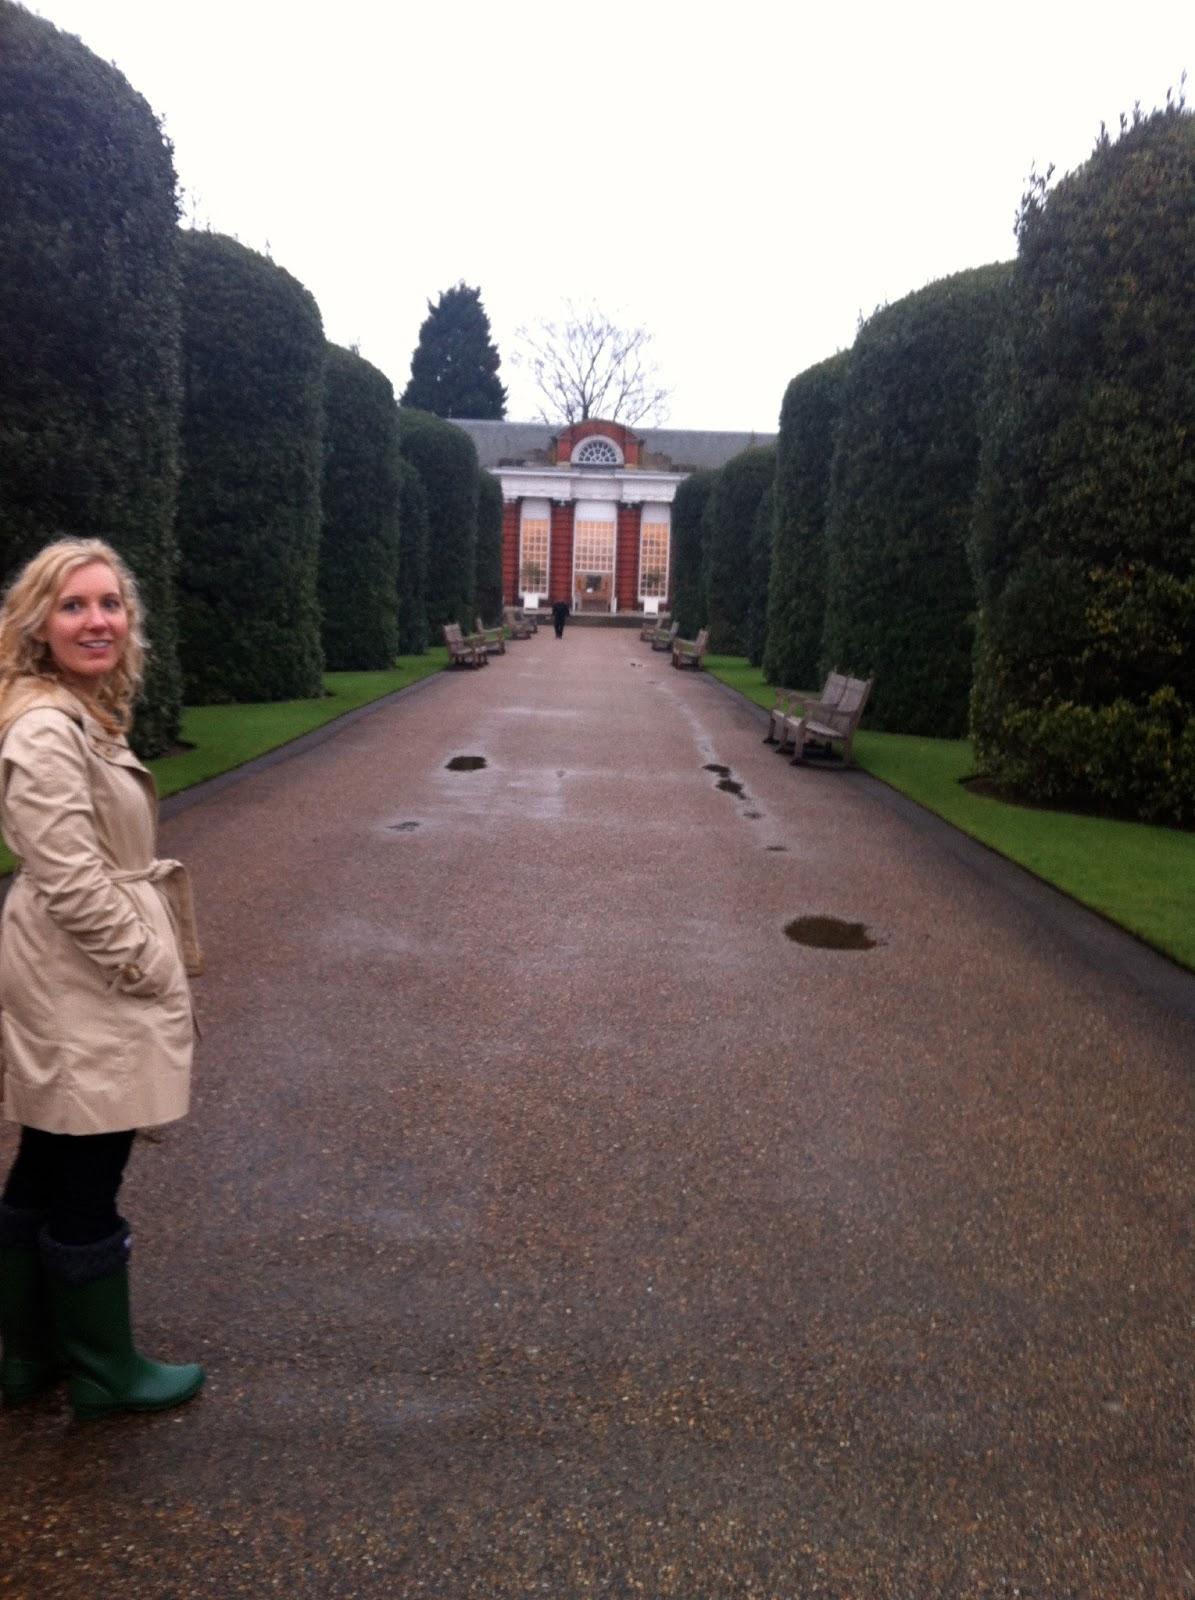 Elizabeth at Orangery at Kensington Palace, London